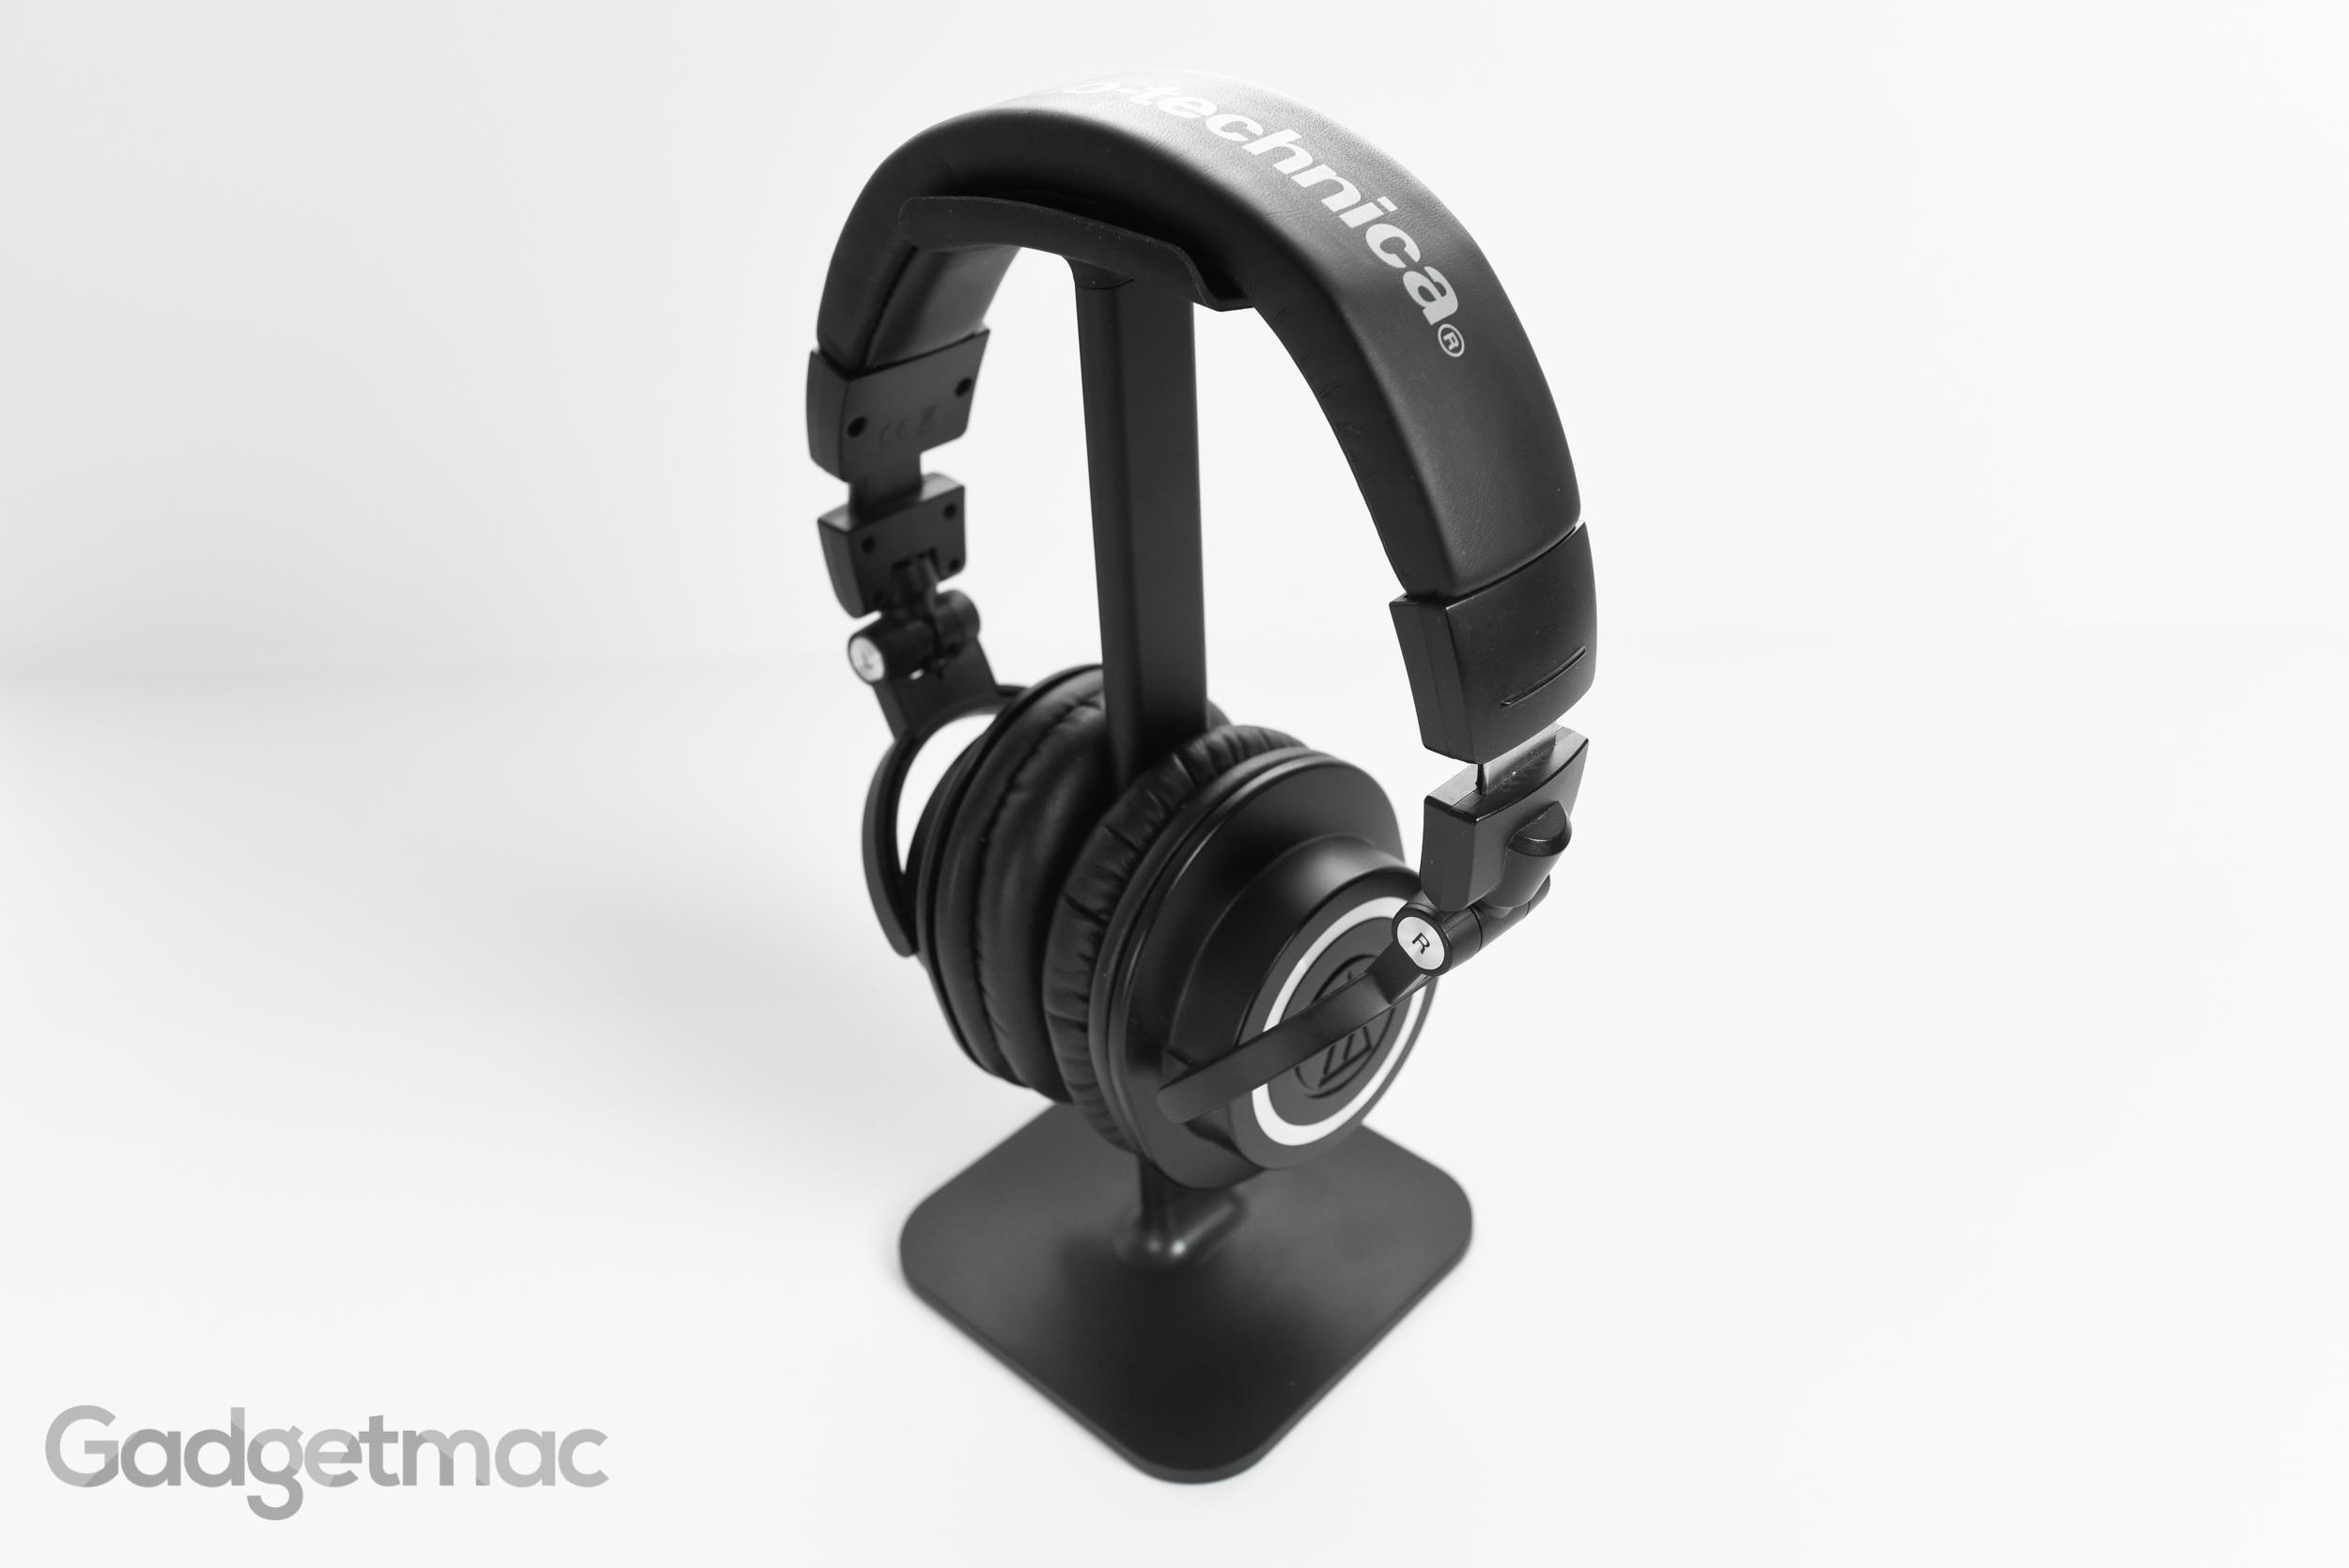 bluelounge_posto_headphone_stand_with_audio_technica_mh50x.jpg